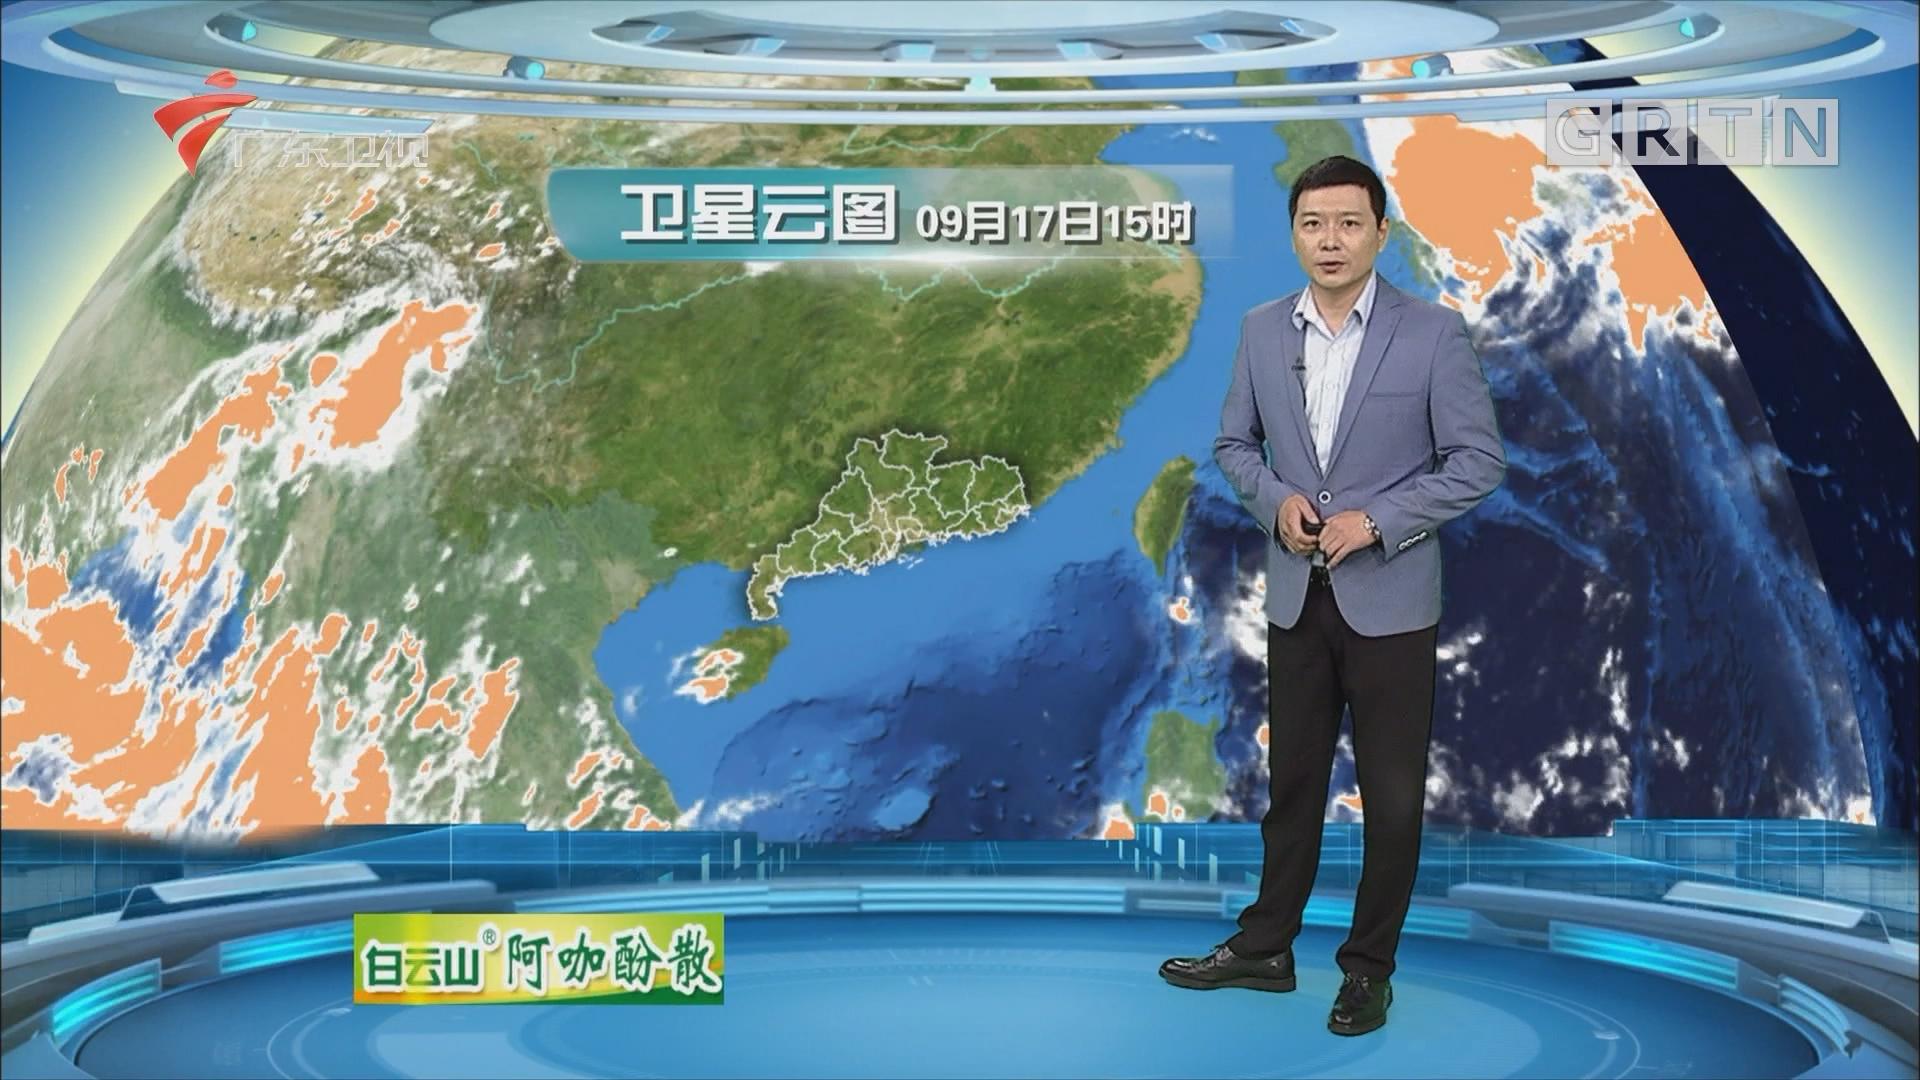 [HD][2017-09-17]广东天气预报